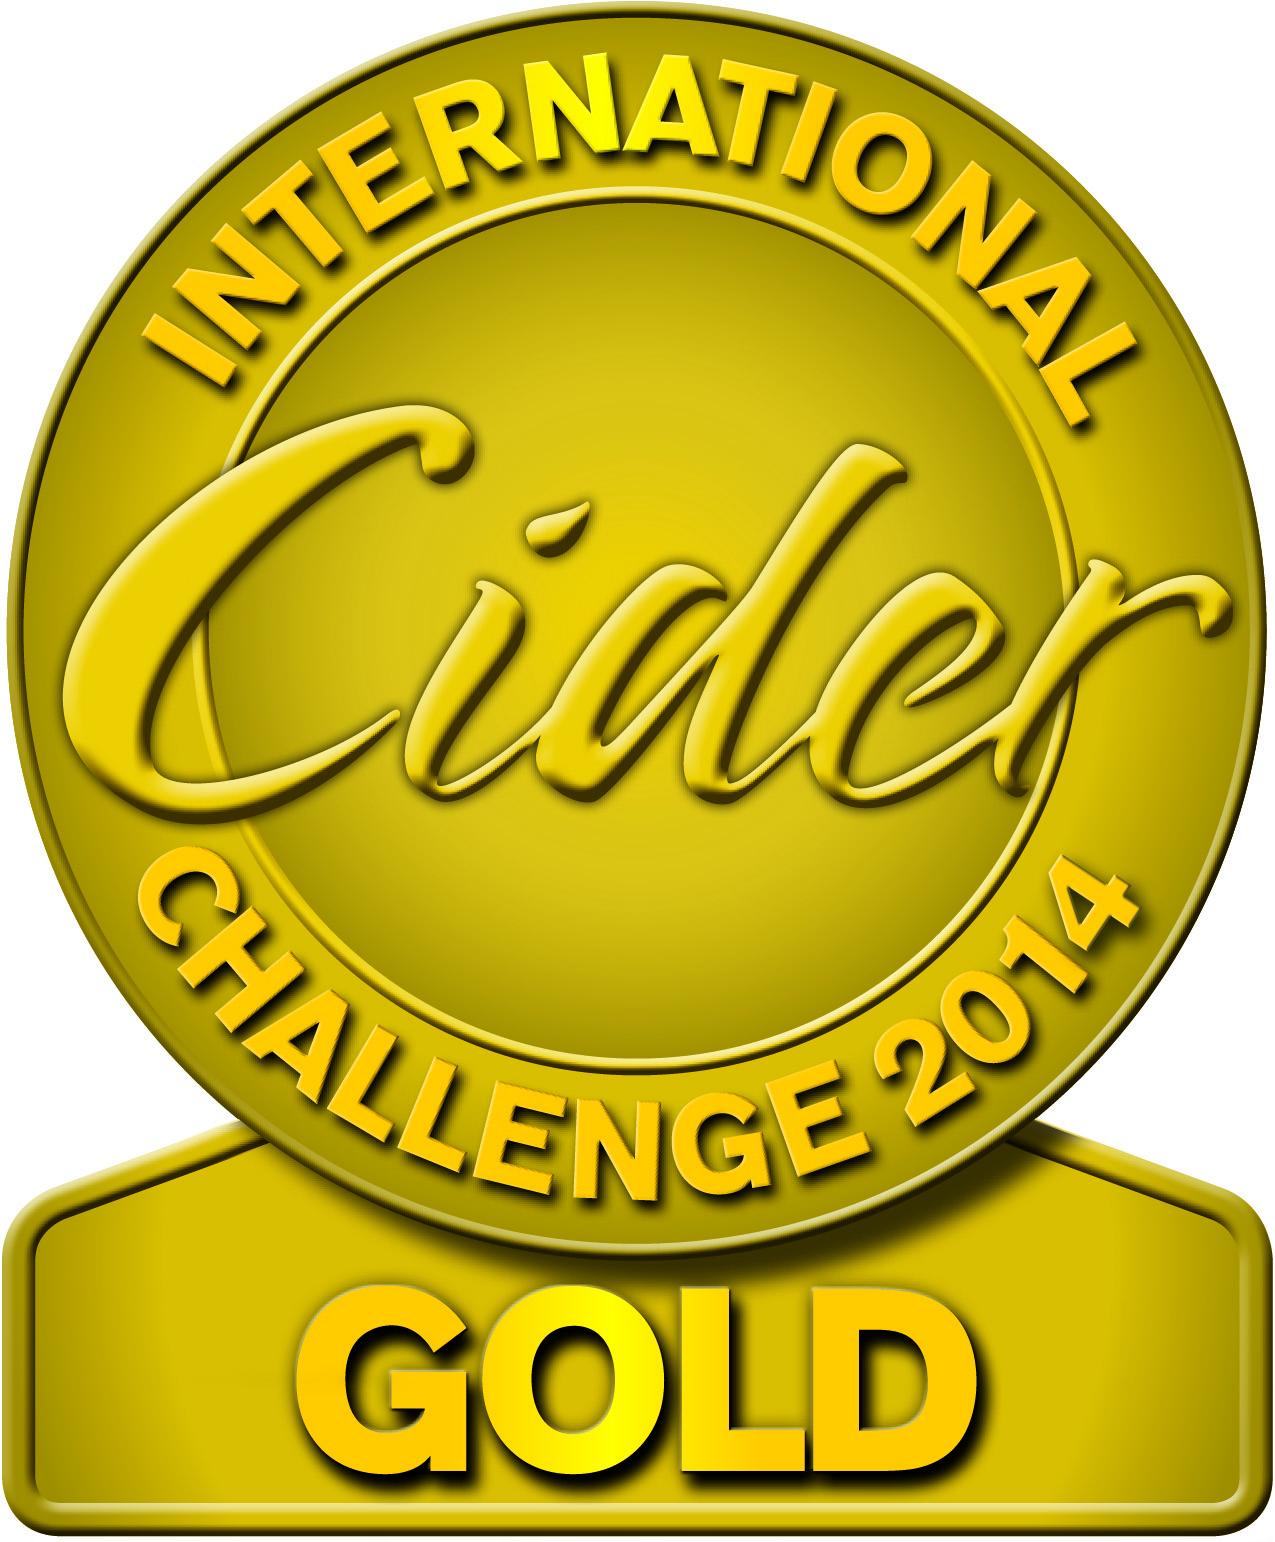 Hazy Daisy Gold 2014, International Cider Challenge